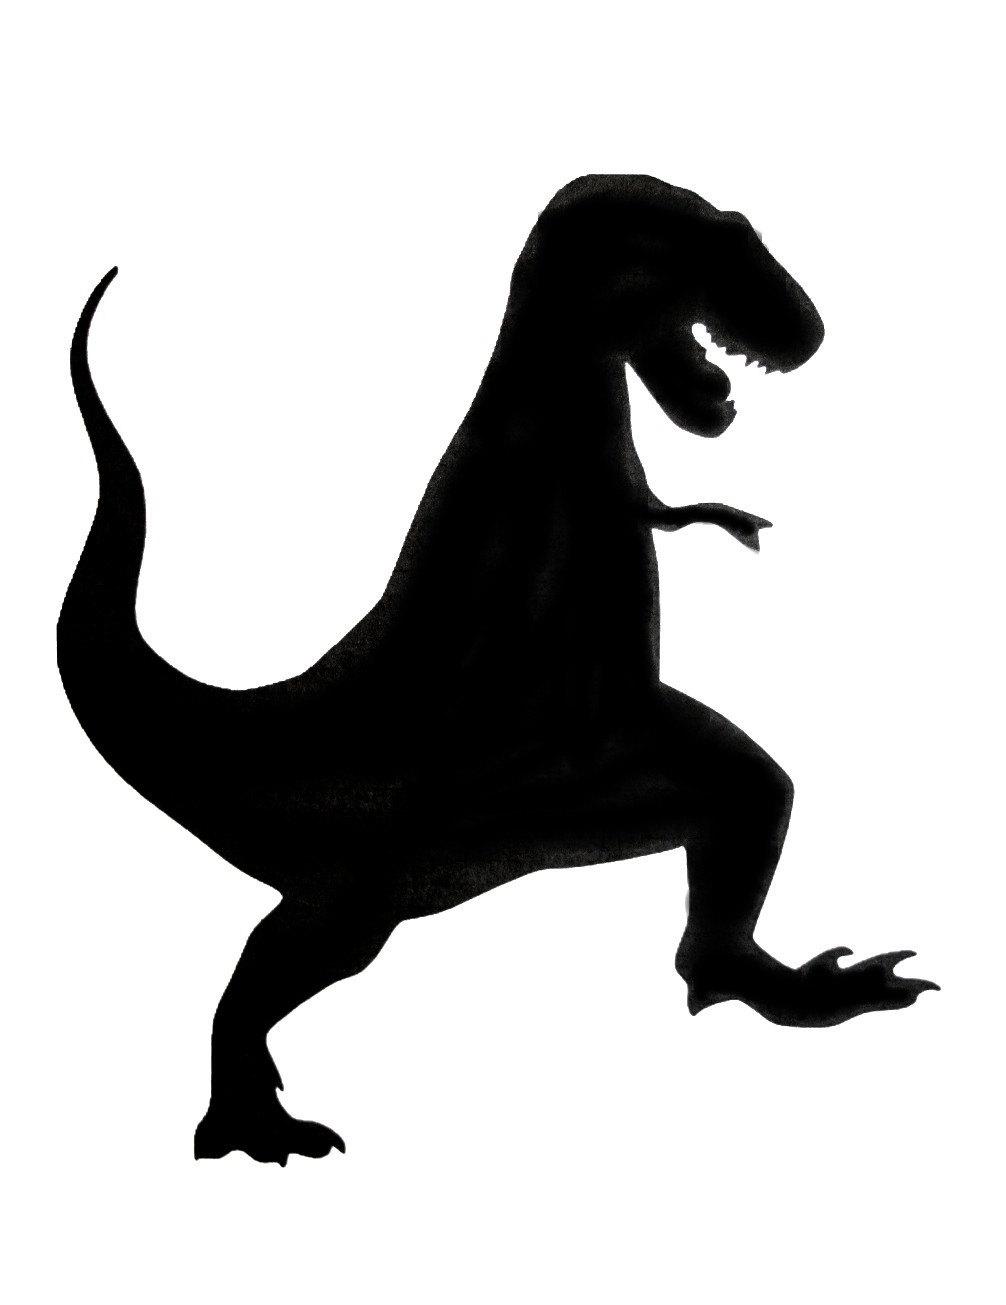 1006x1305 Dinosaur Silhouette Clipart 53 Simple T Rex Robertjhastings Net